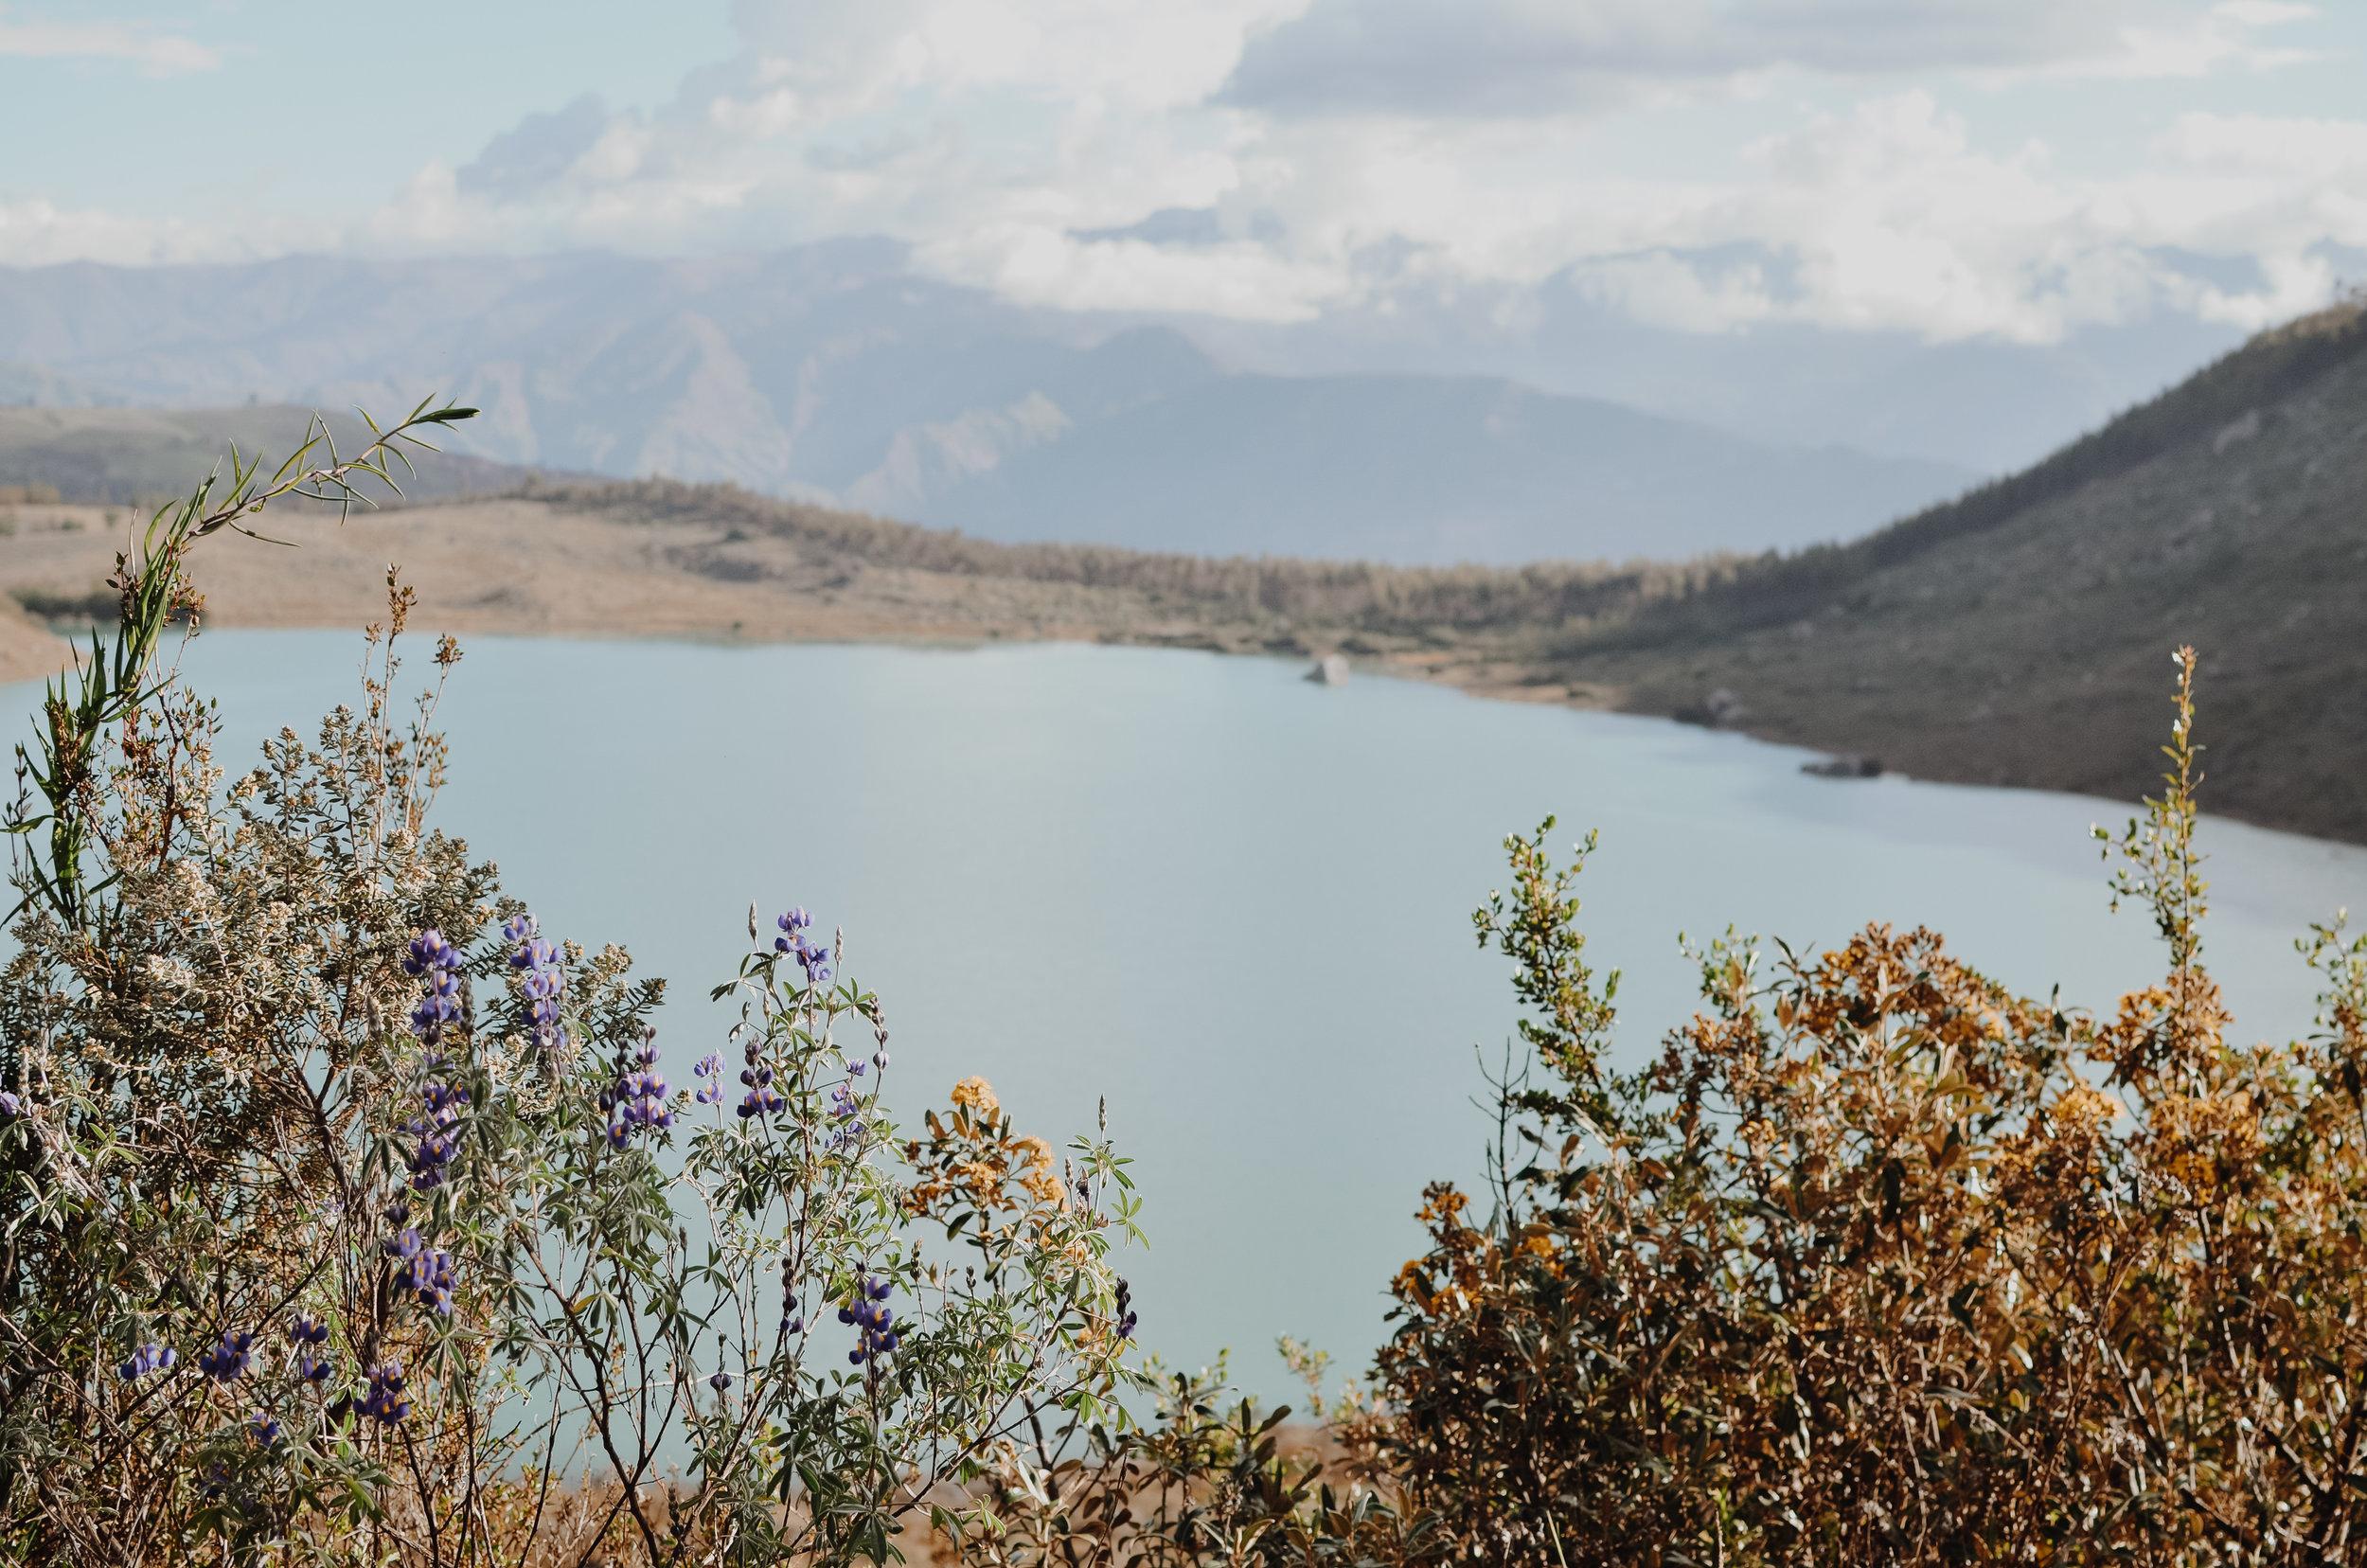 laguna+lake+69+hike+peru+travel+guide+life+on+pine_DSC_0402.jpg